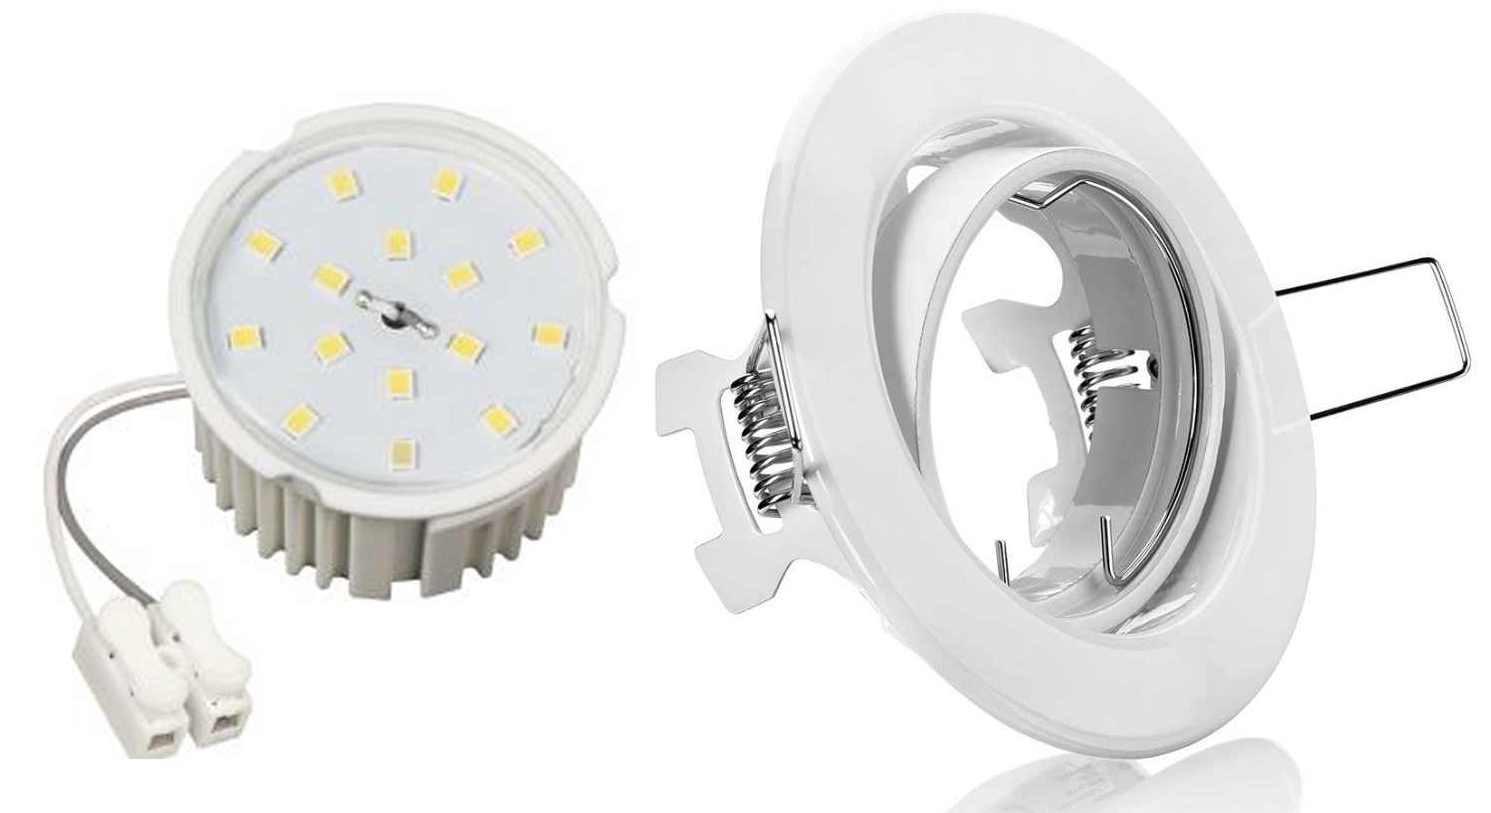 8 x Flache Led Einbauspot Lampe Weiß 230 Volt mit Led Modul 3step dimmbar 110° 50 x 33mm warmweiss 7Watt 510Lumen 230Volt